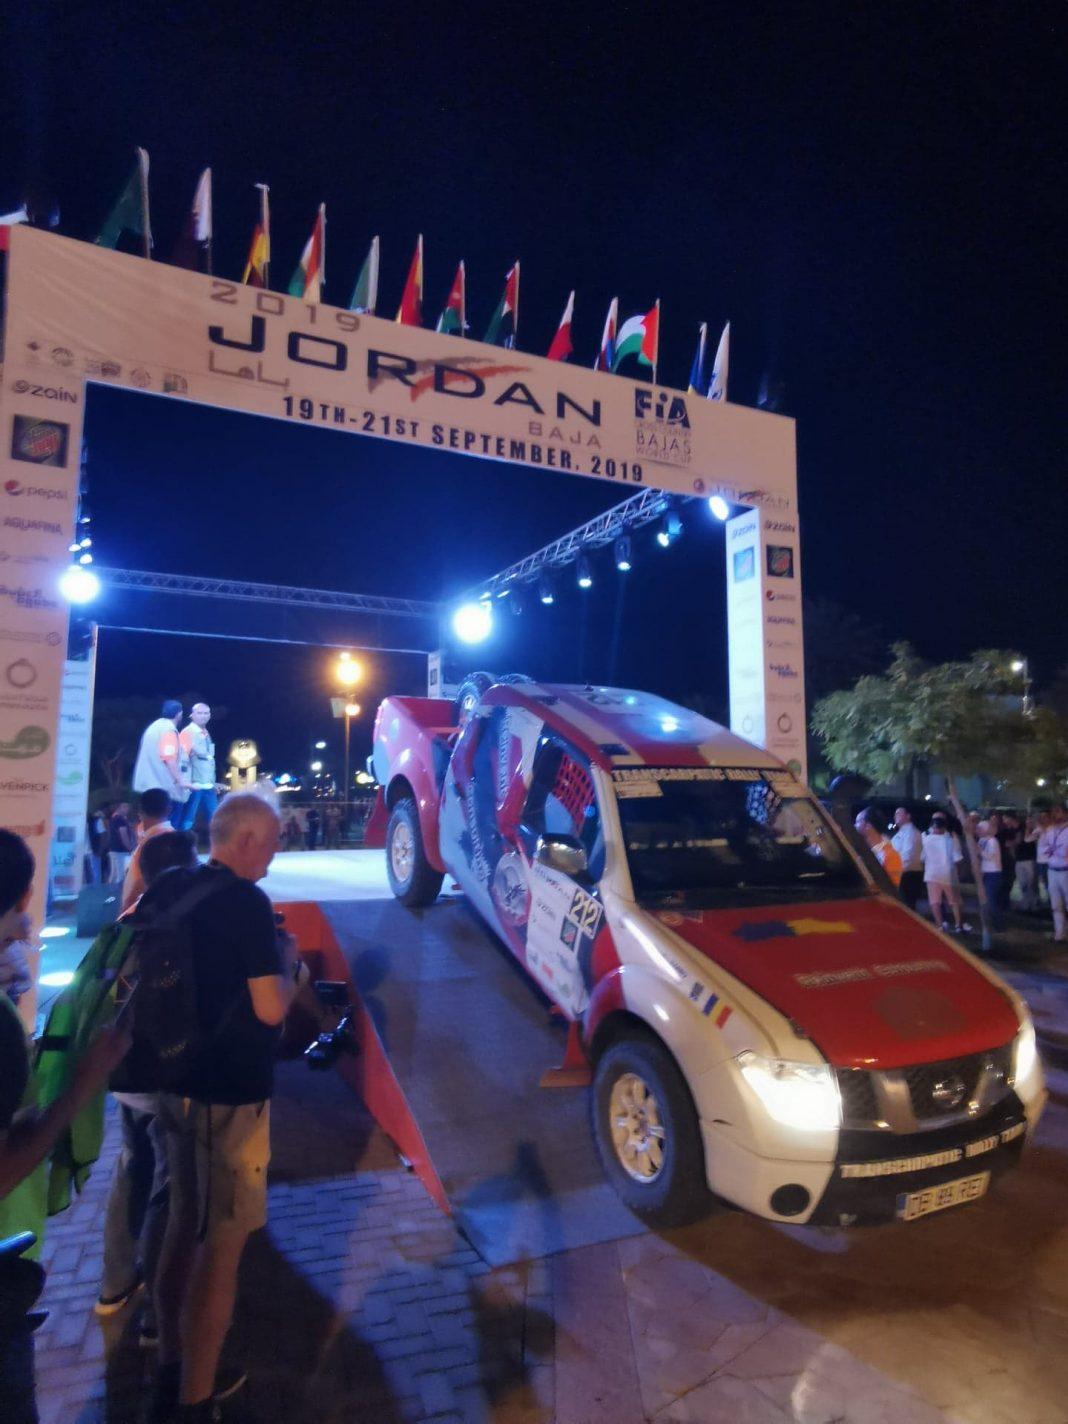 70683434_754996298264137_7551129397785264128_n-1068x1424 Jakub Przygonski castiga prima editie Jordan Baja